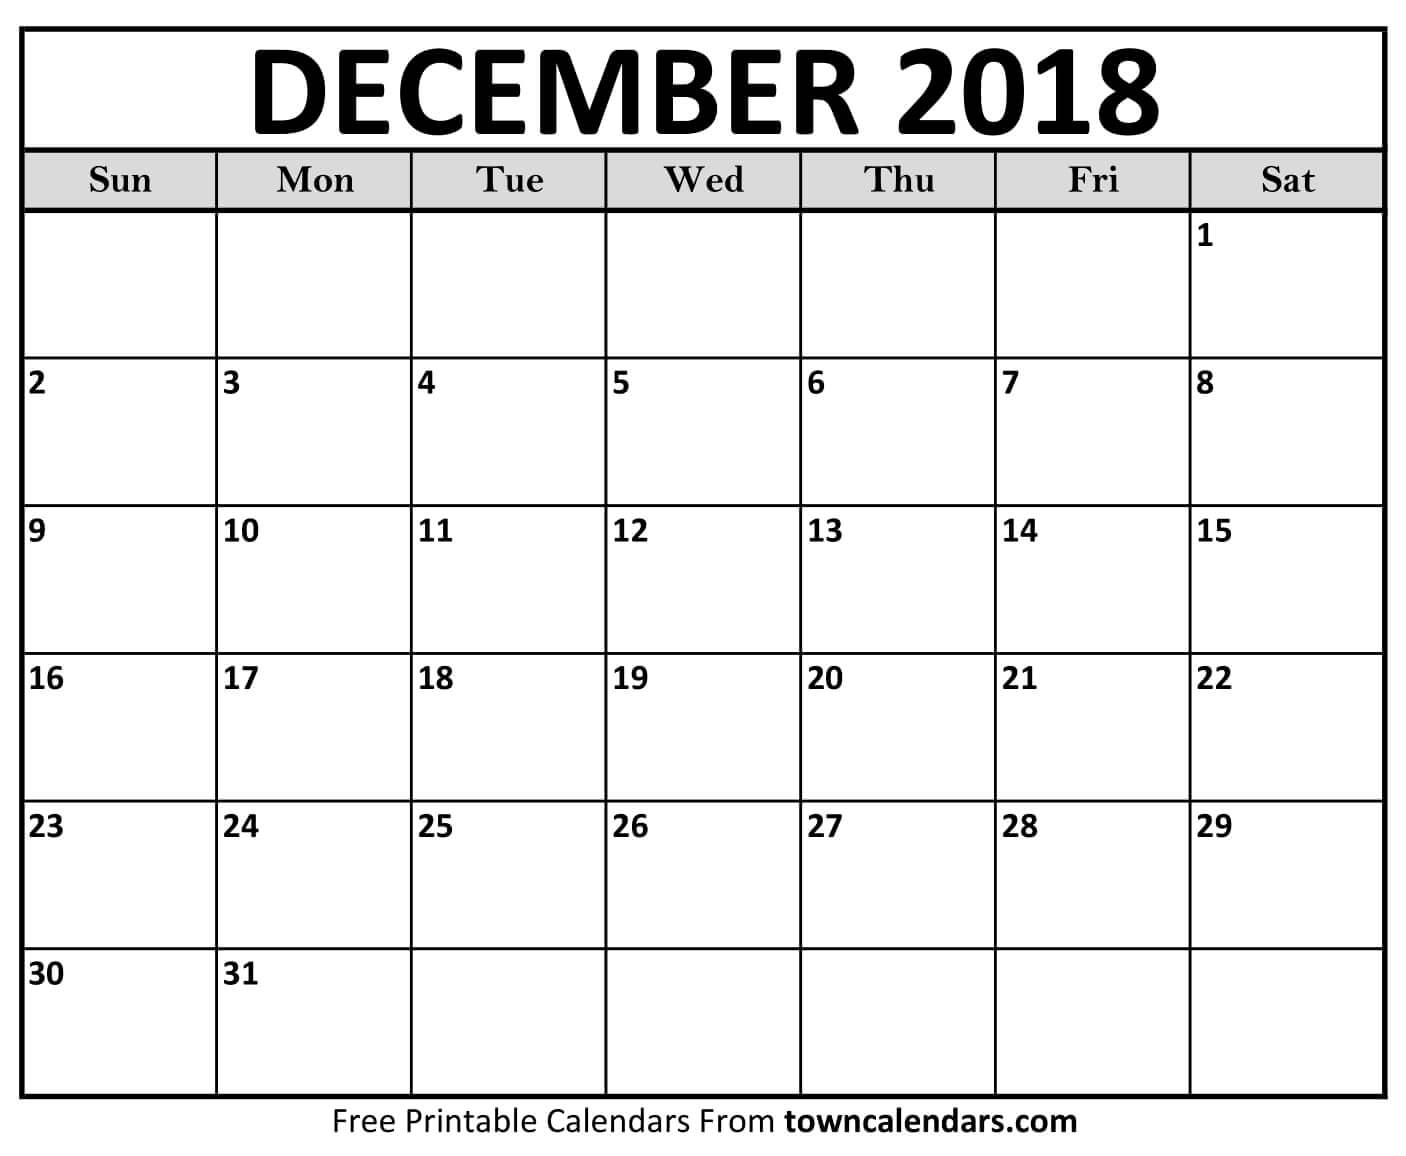 Printable 2018 December Calendar Template - Printable Calendar 2019 pertaining to Blank Printable December Calandar